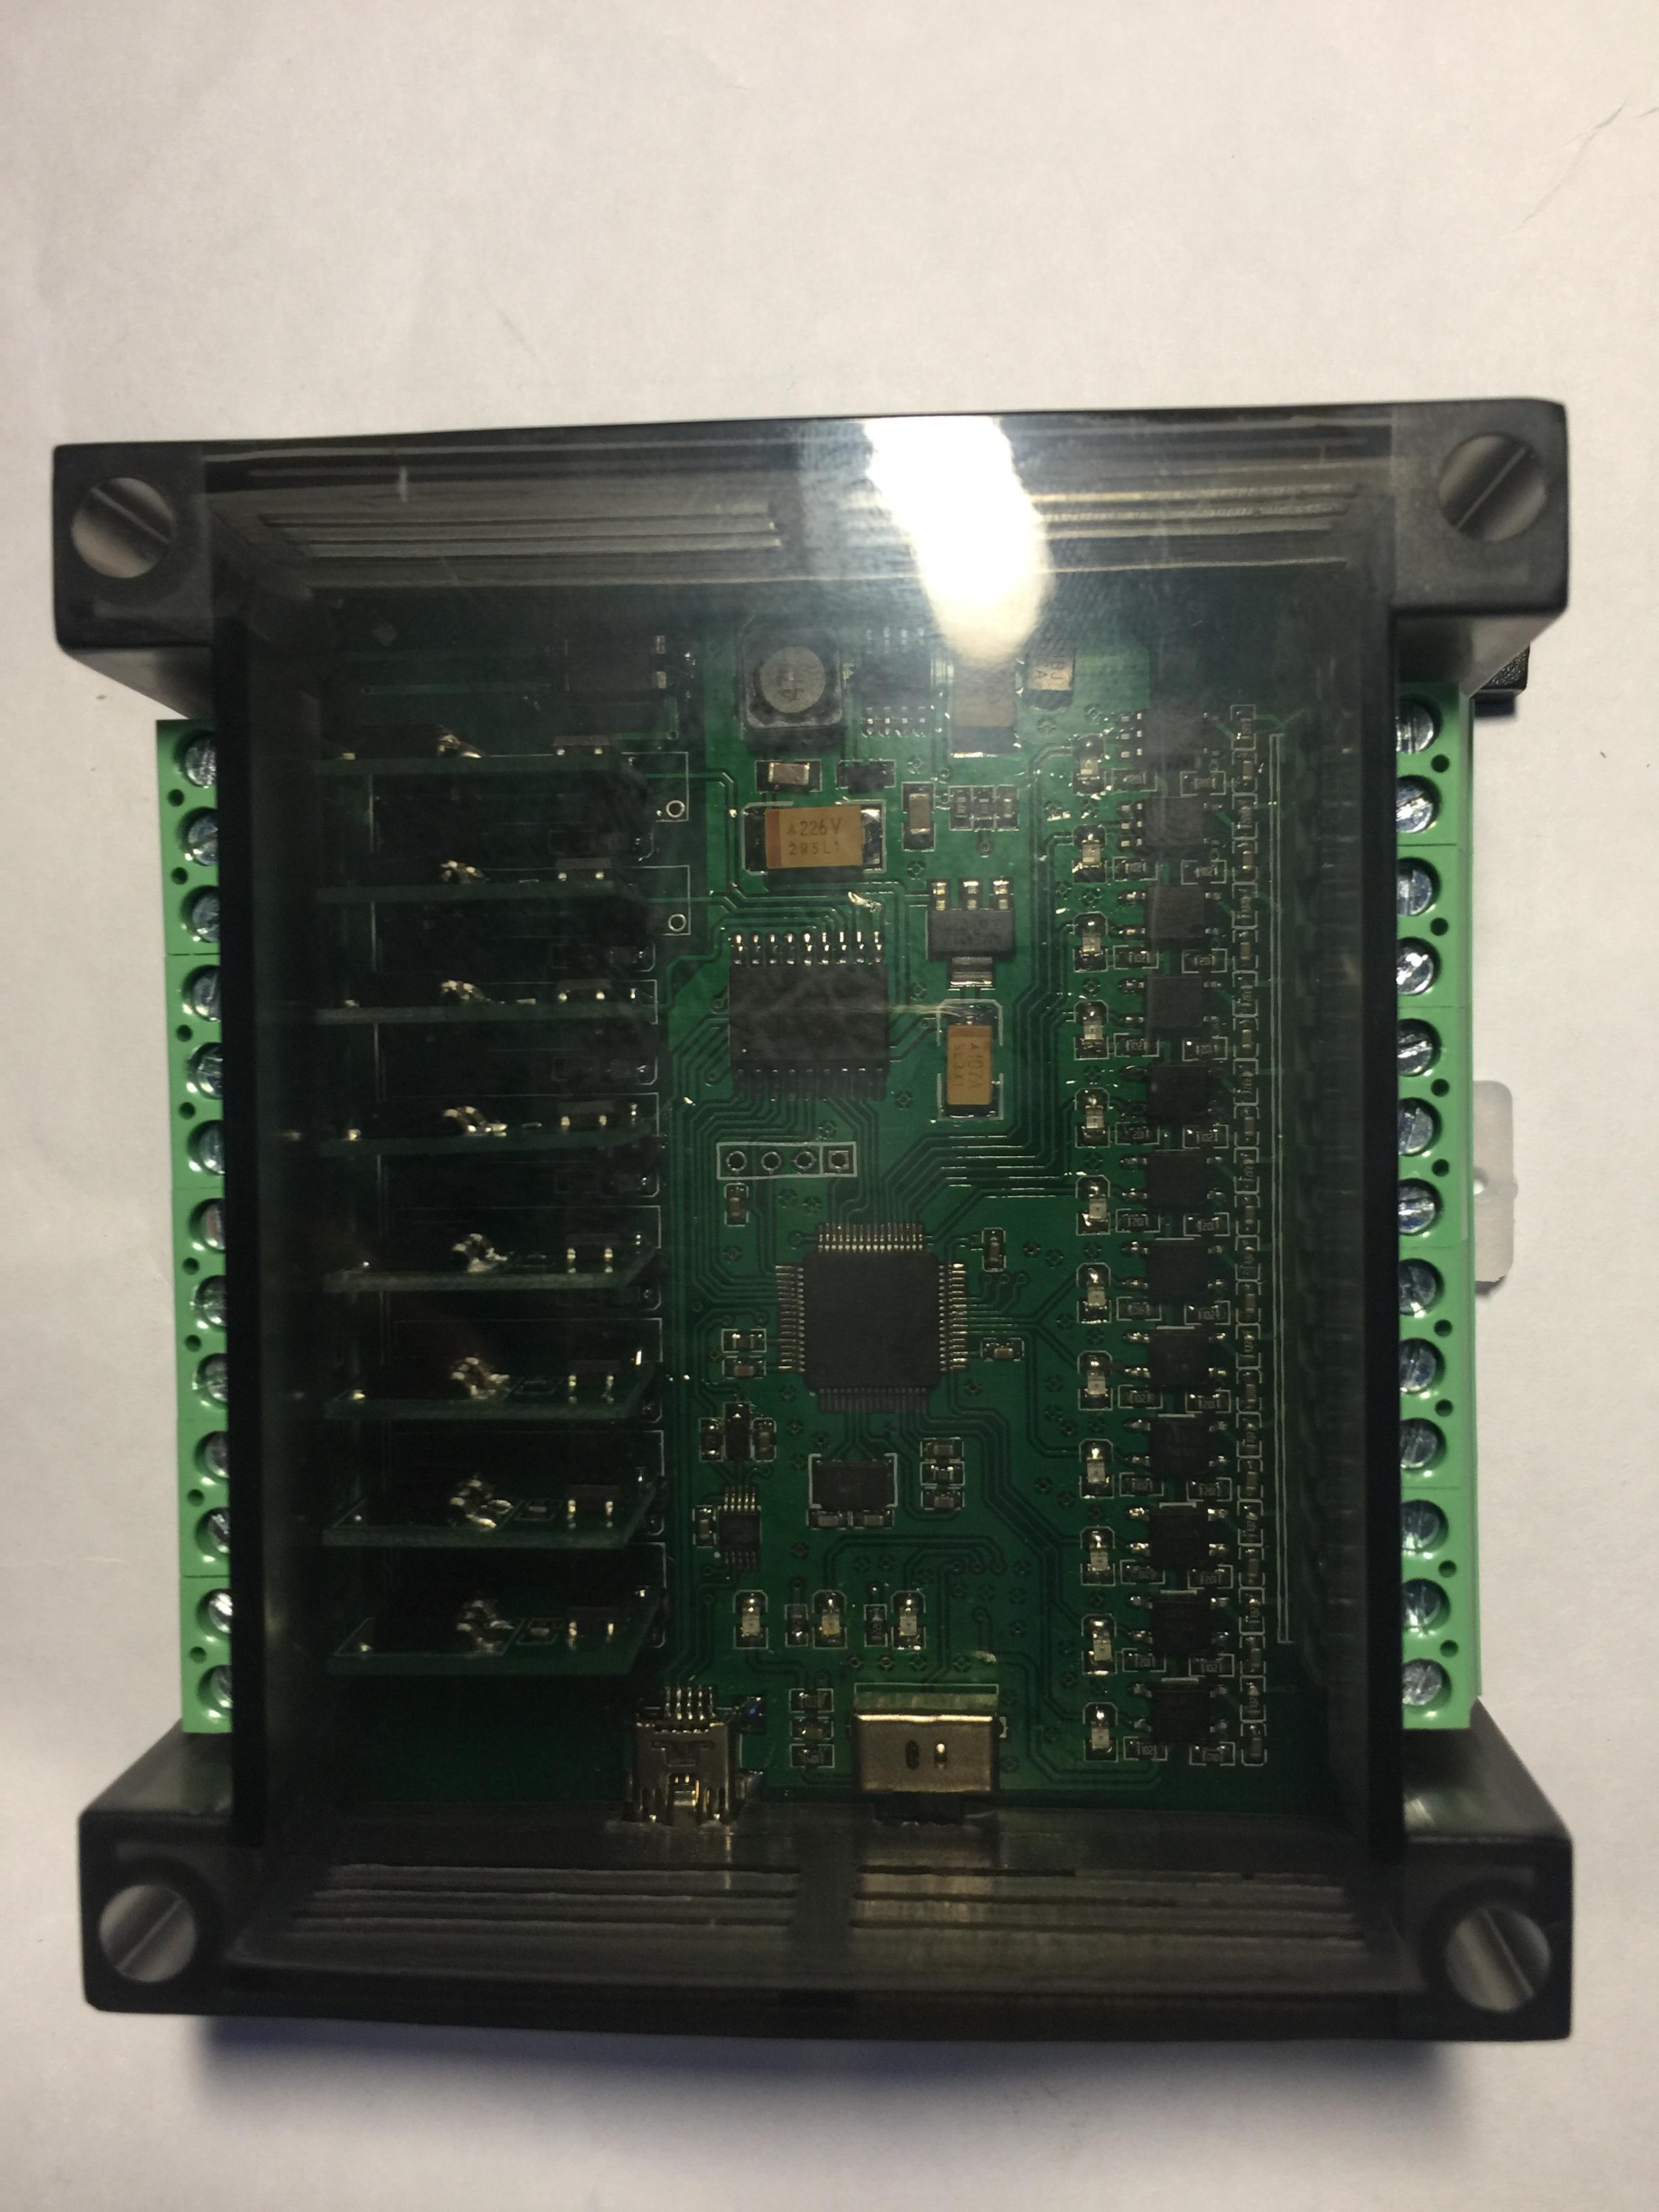 PLC労働者の訴える版FN2Xシリーズじゅうに進はち出高速パルスABエンコーダ停電保存三菱ソフト